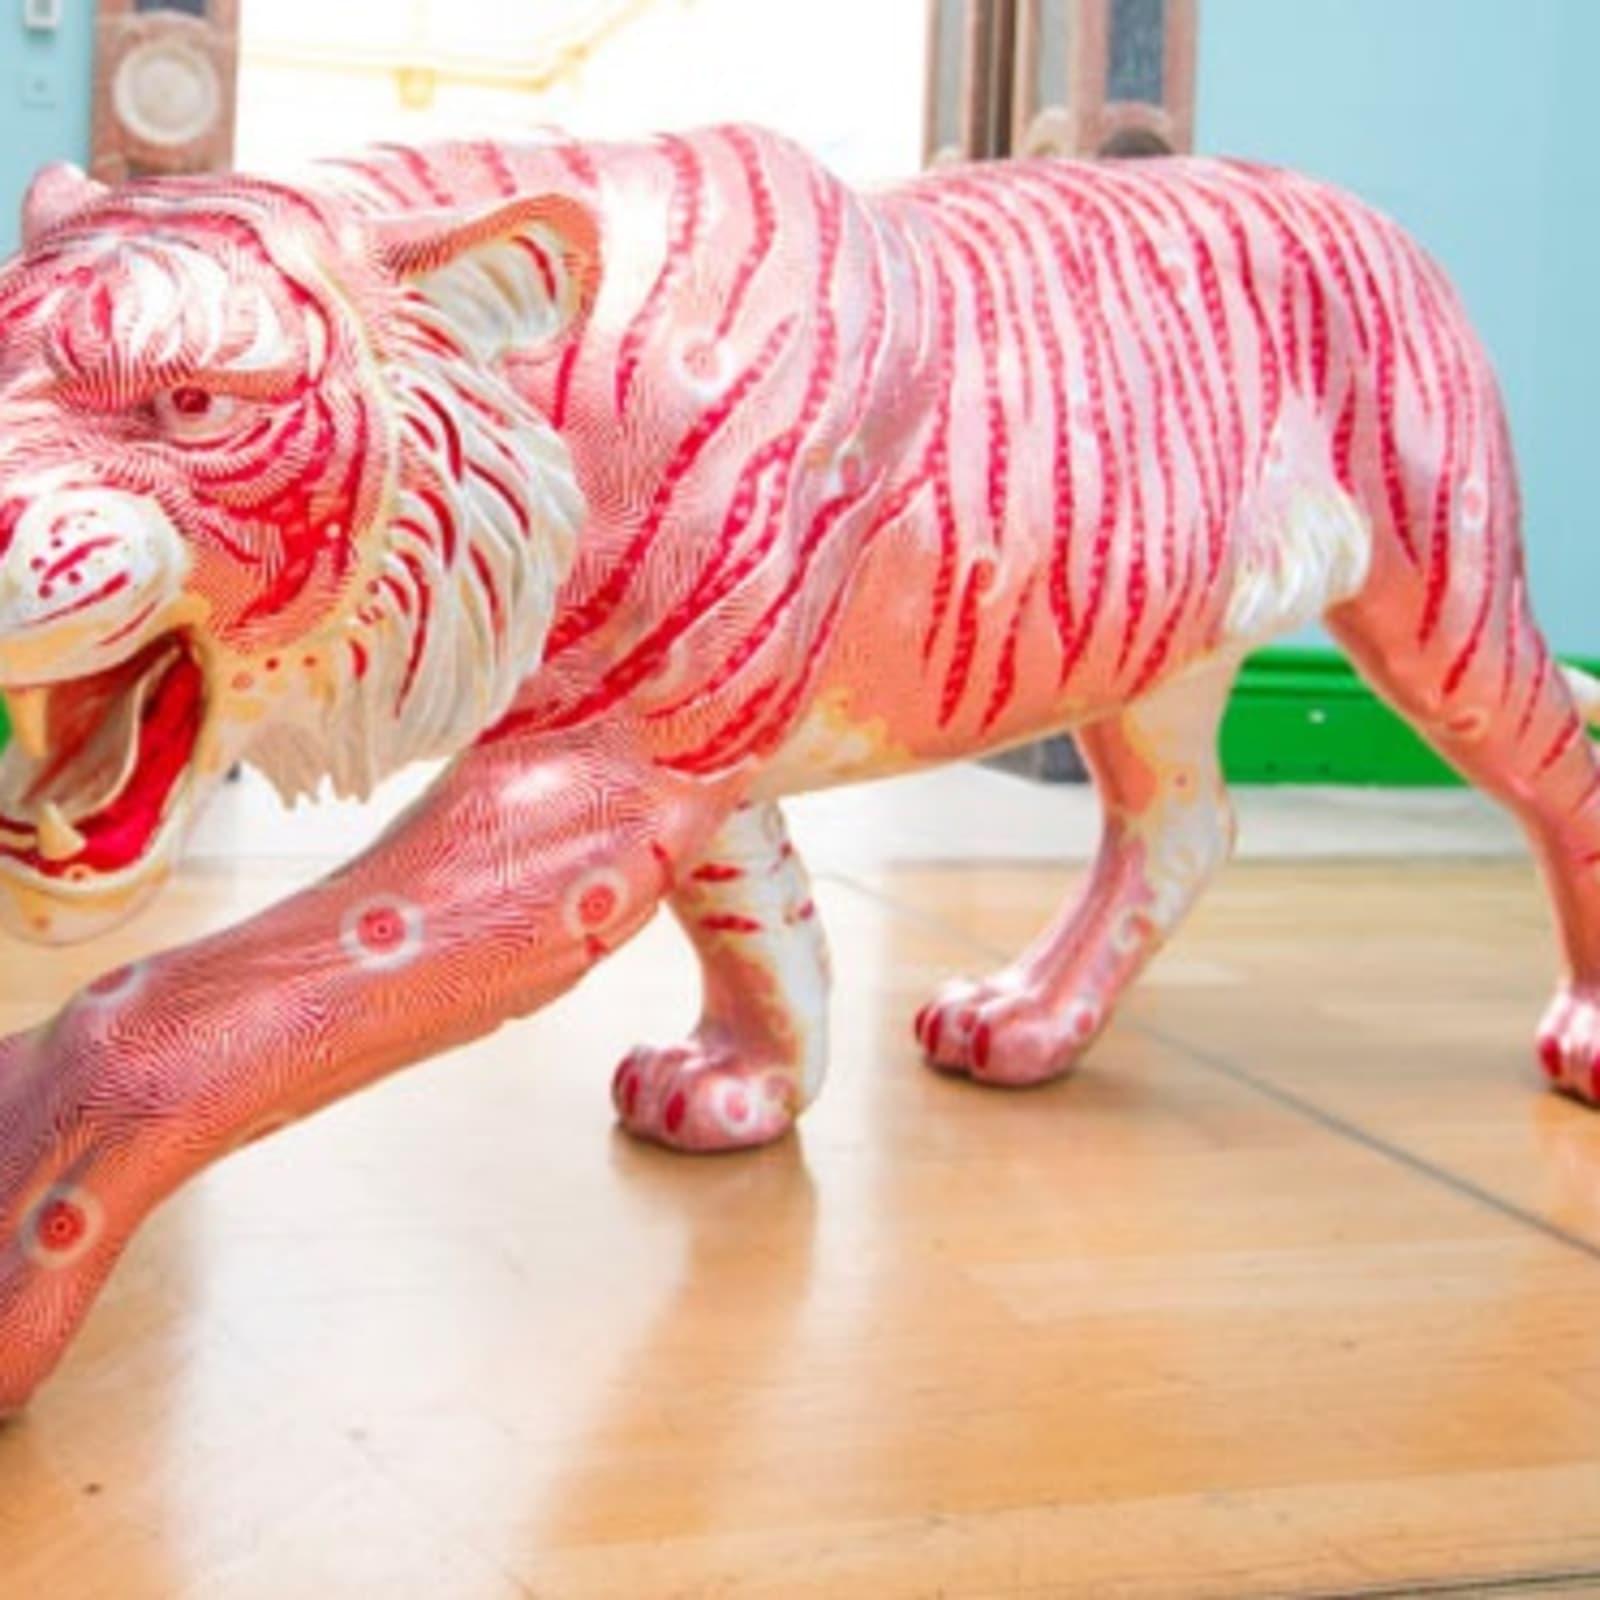 David Mach & Robert Mach, Easy Tiger, 2019, Resin & foil, Edition of 4